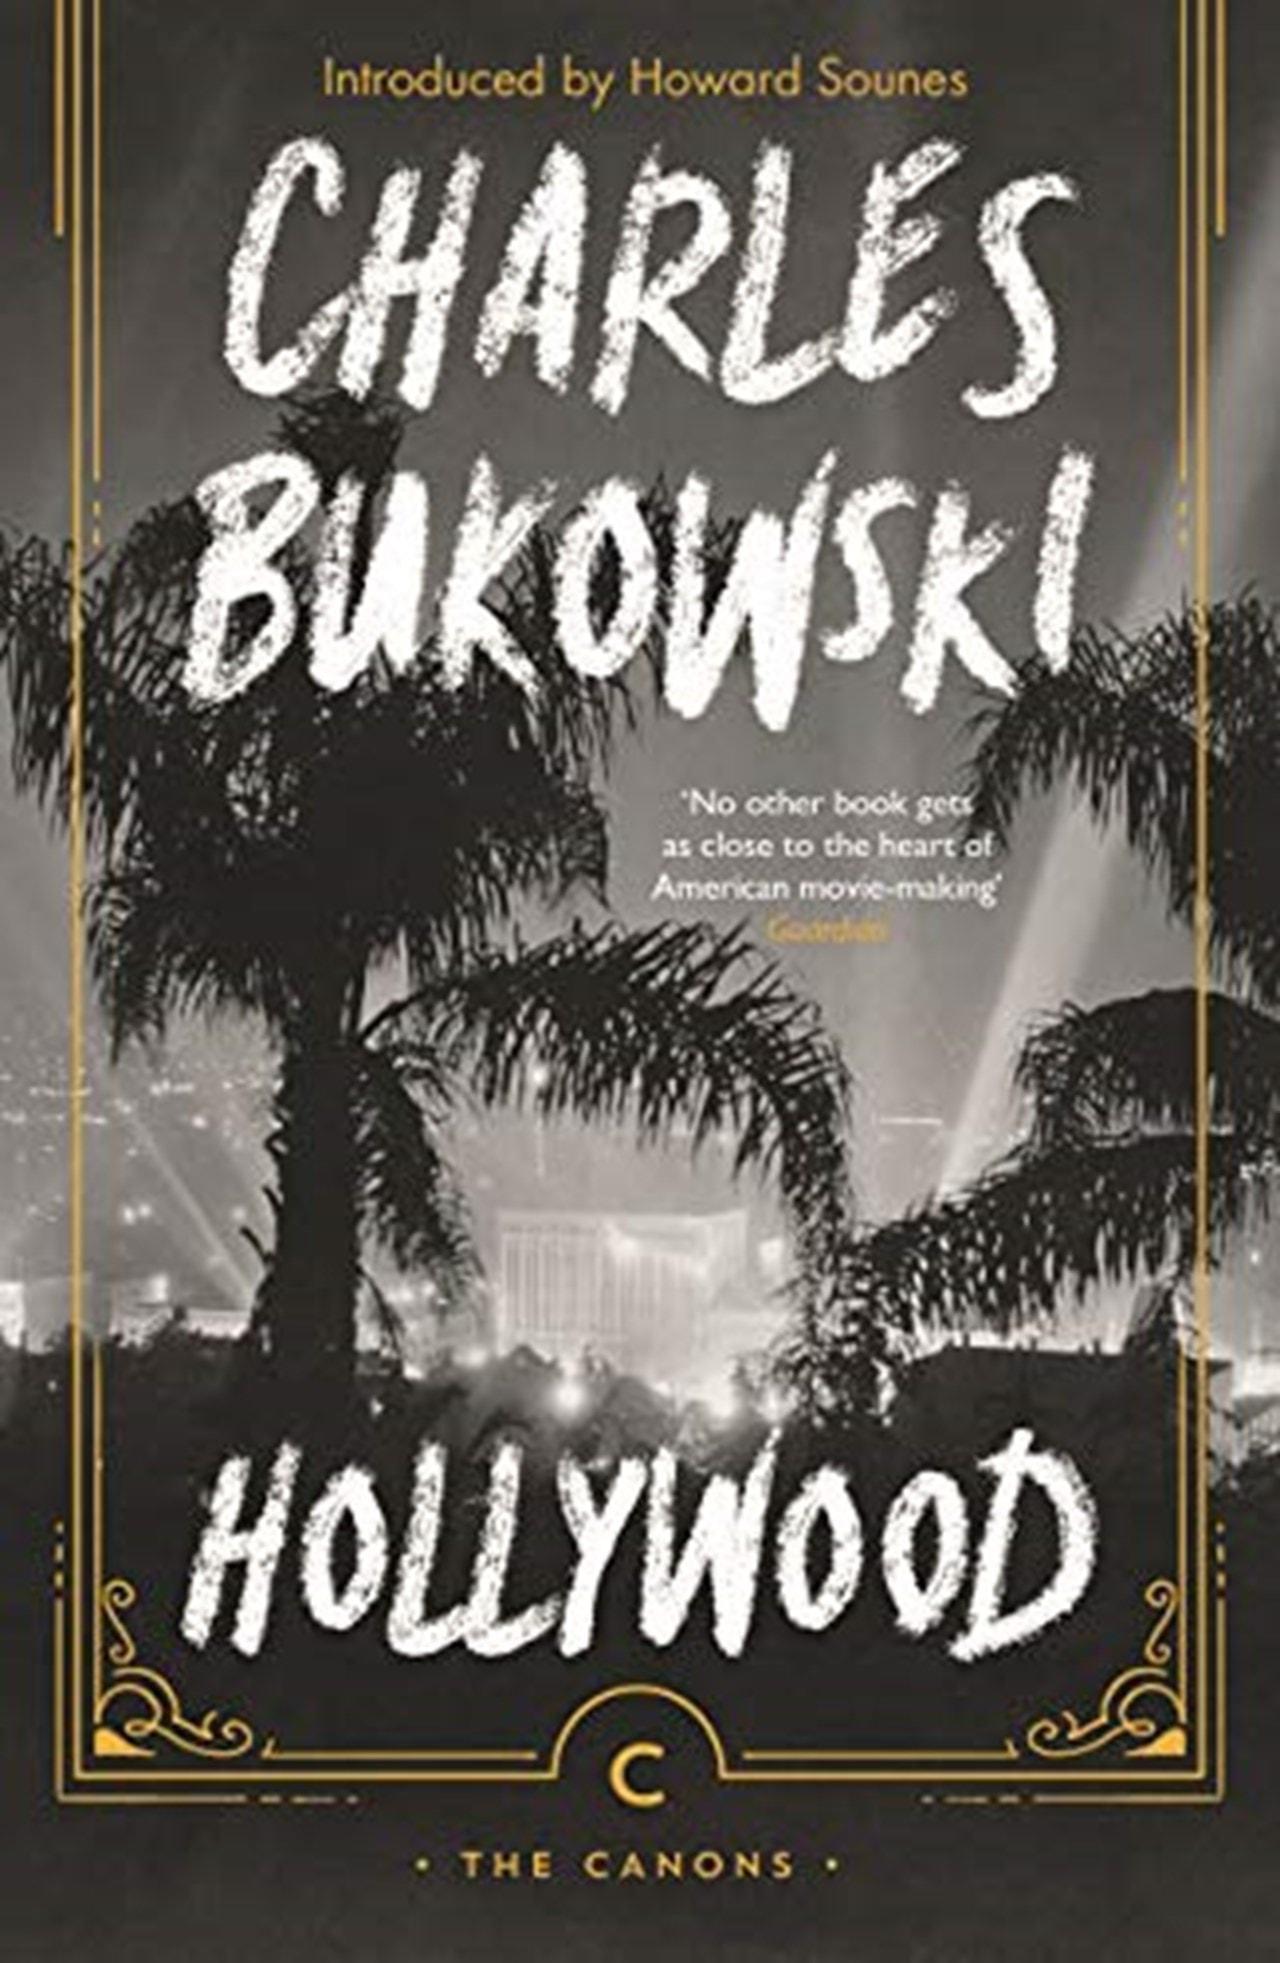 Hollywood - 1